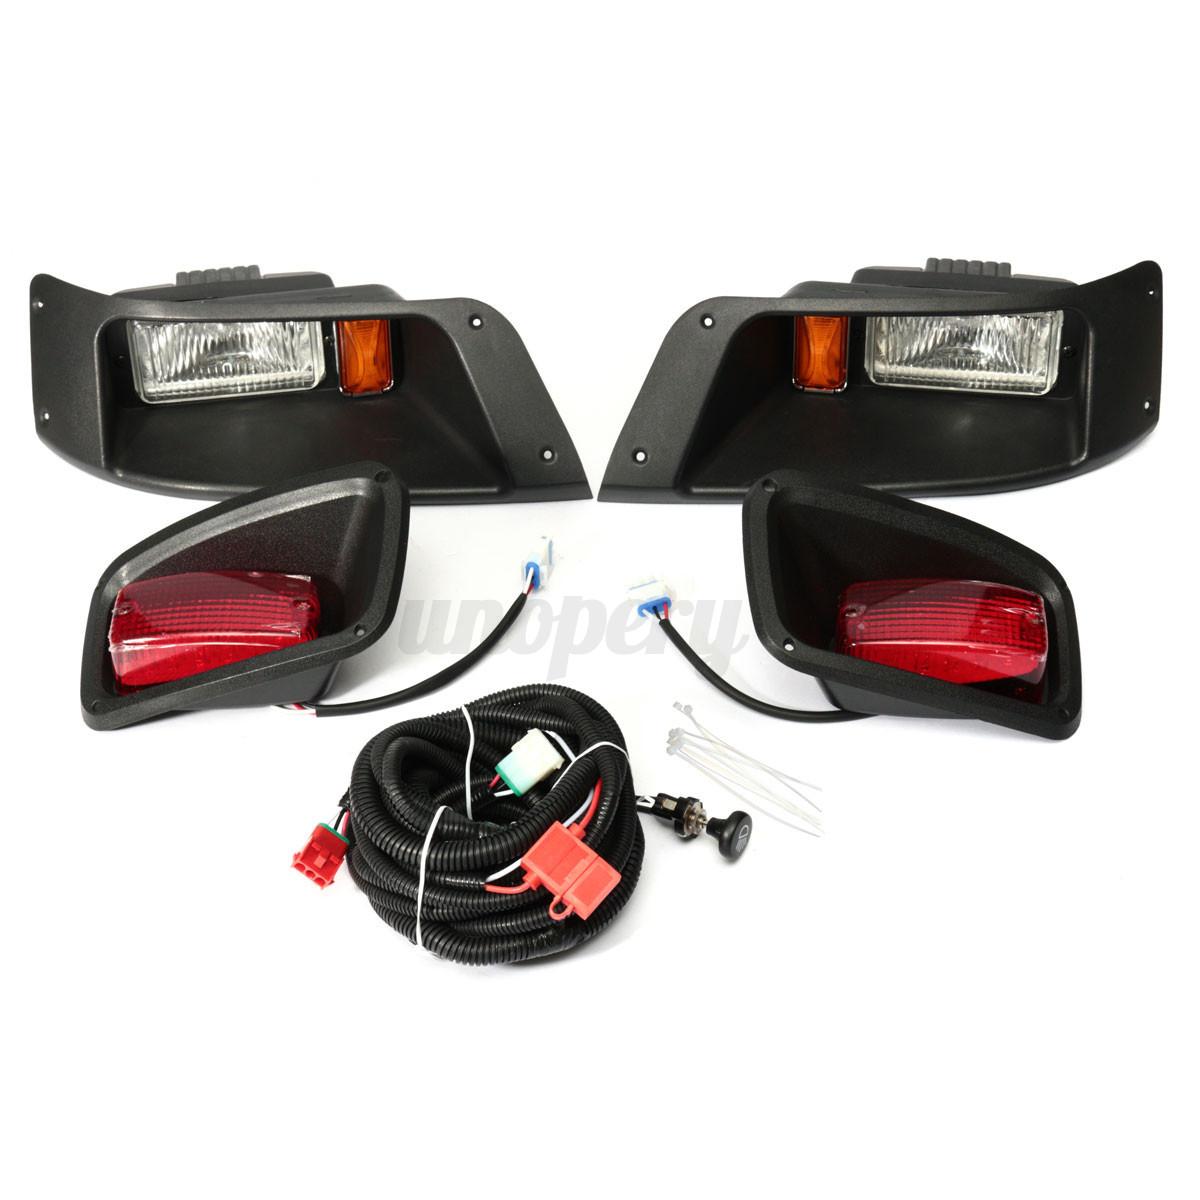 Halogen Headlight With Led Tail Light Lamp Kit For Ezgo